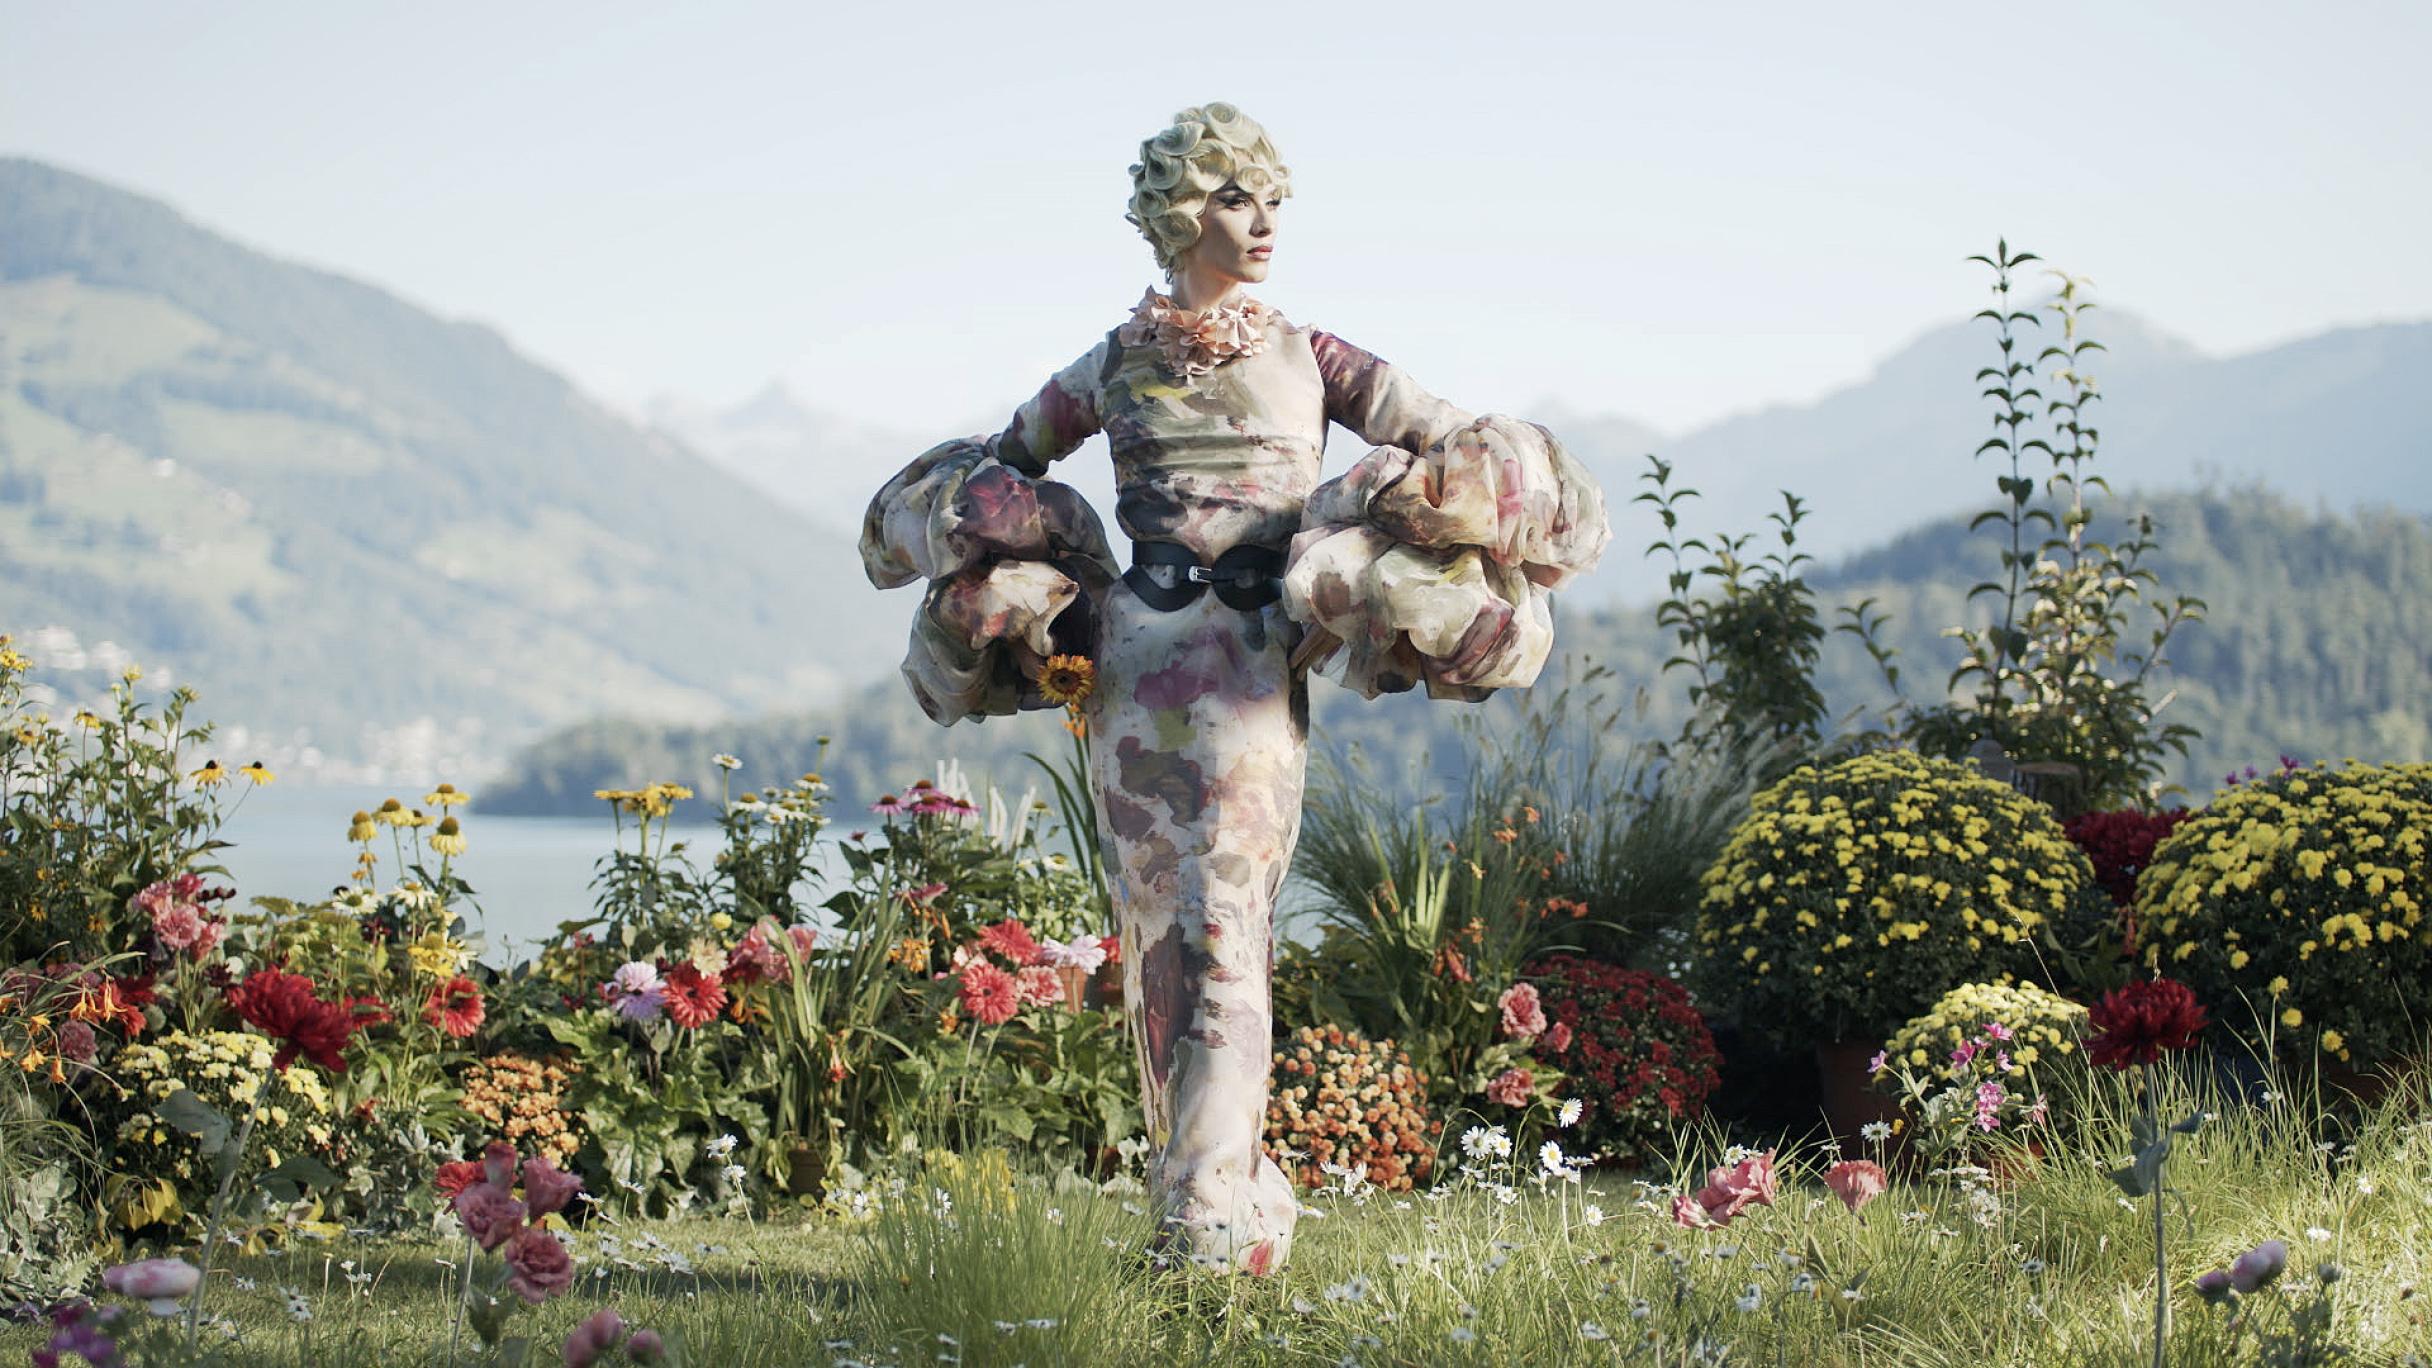 Miss Fame outside in flower landscape